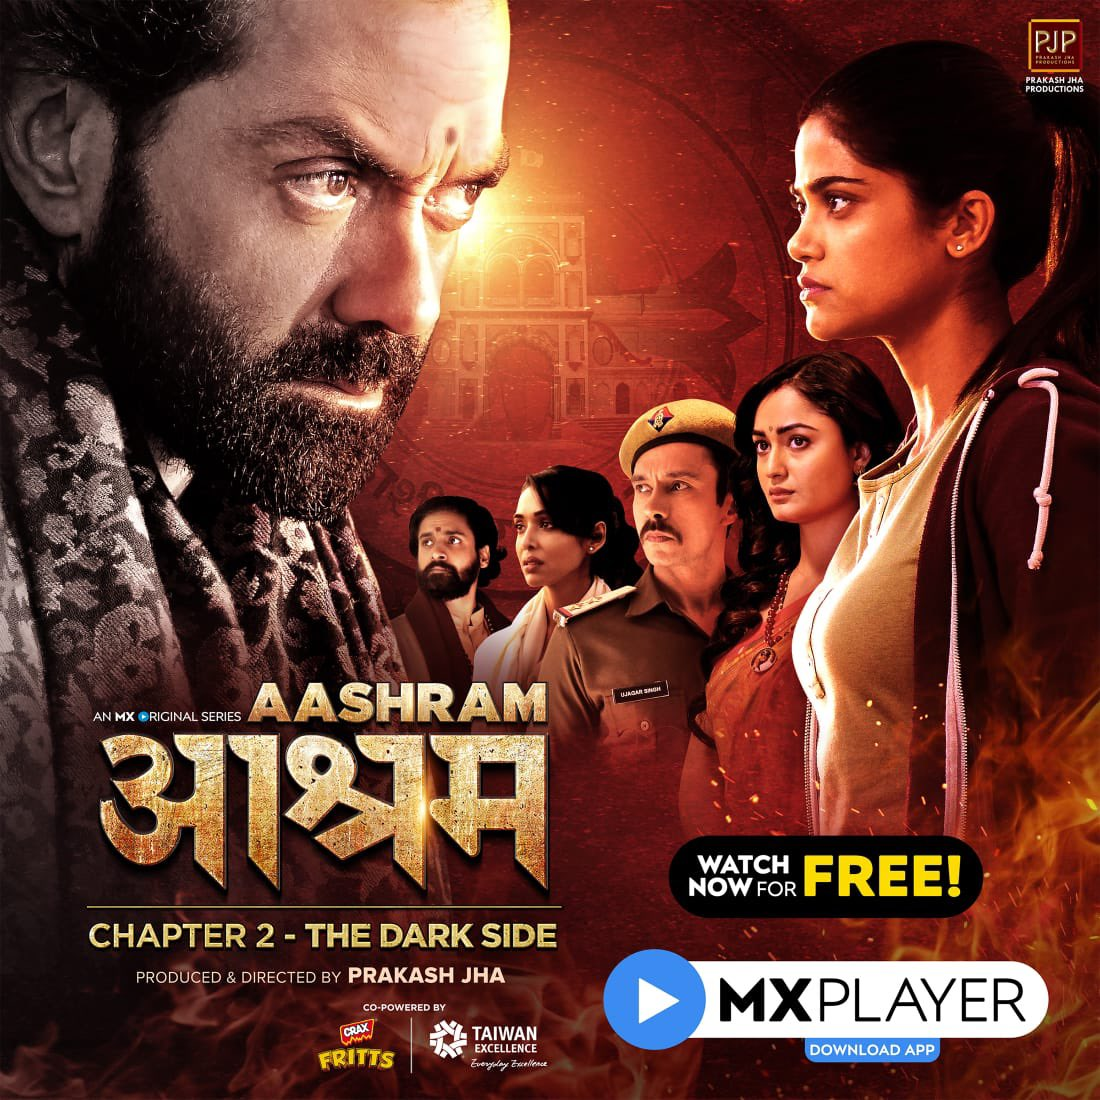 #AashramChapter2, all episodes out on @mxplayer. Watch now:  #Aashram #MXOriginalSeries #MXPlayer @prakashjha27 @AaditiPohankar @IamRoySanyal @DarshanKumaar @anupria_goenka @AdhyayanSsuman @iamtridha @vikkochhar @tusharpandeyx @iamsacchinshrof @PJP_Online